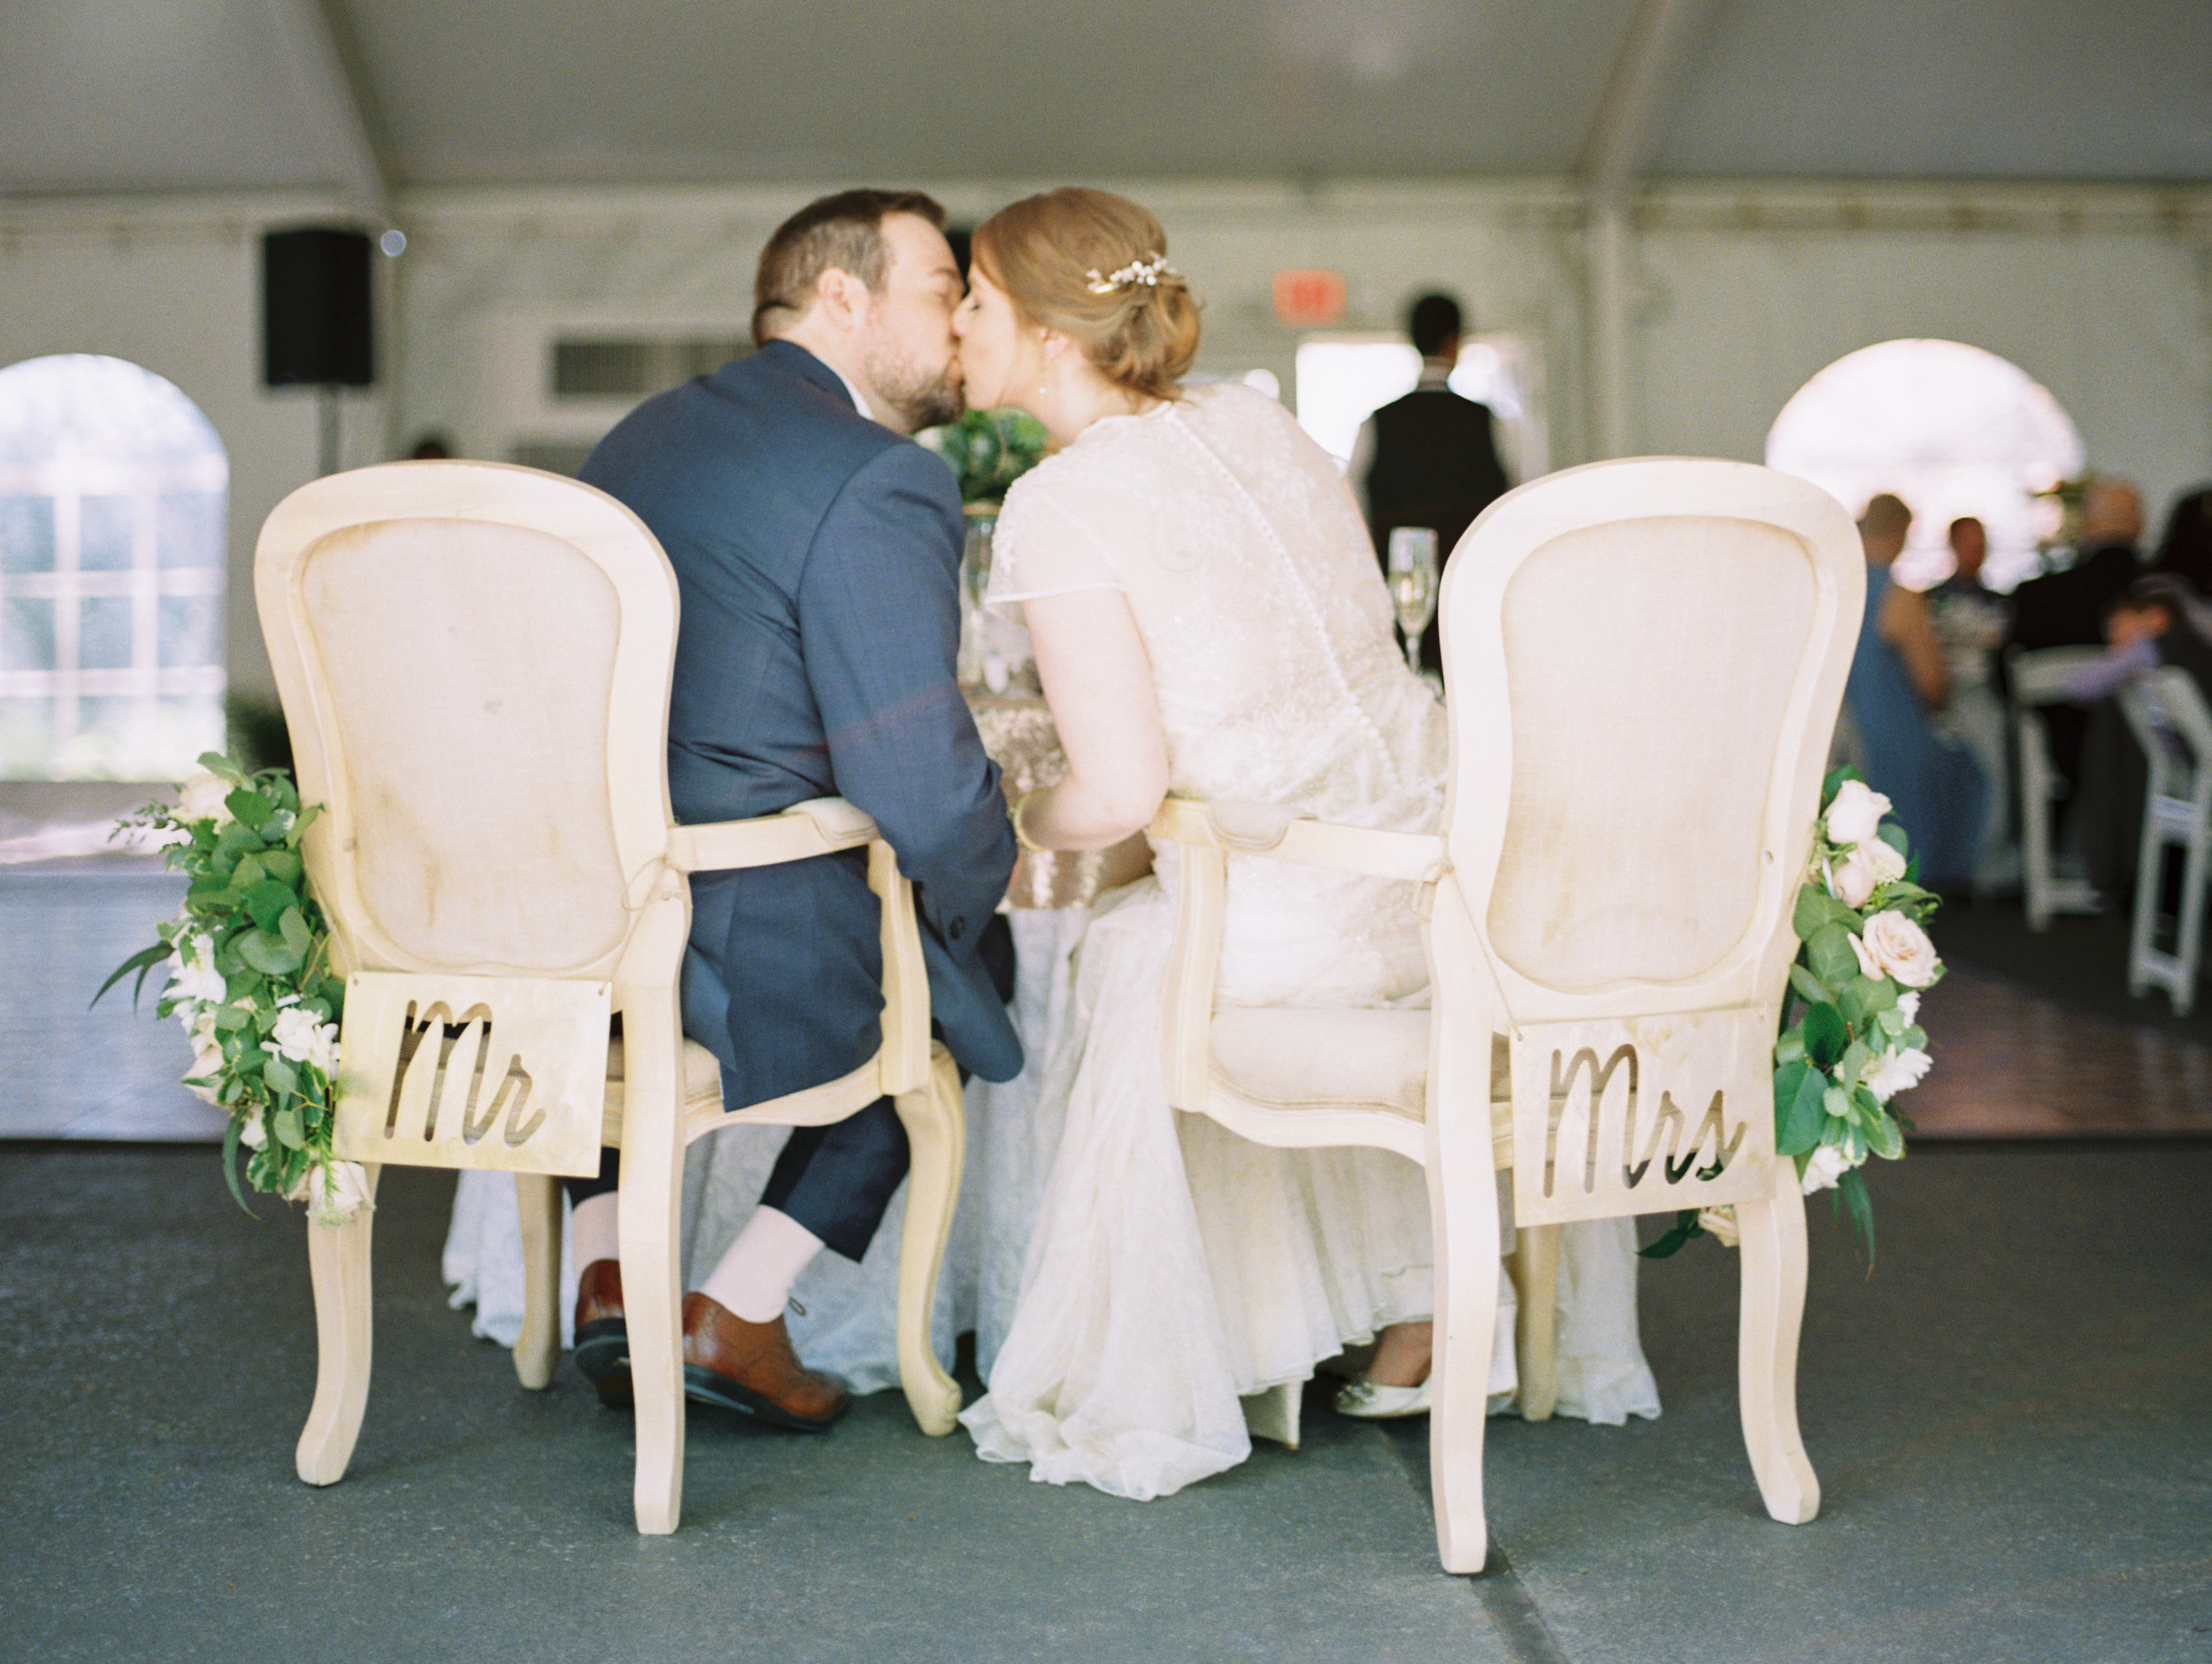 20180428-zakula-molczyk-wedding-398.jpg